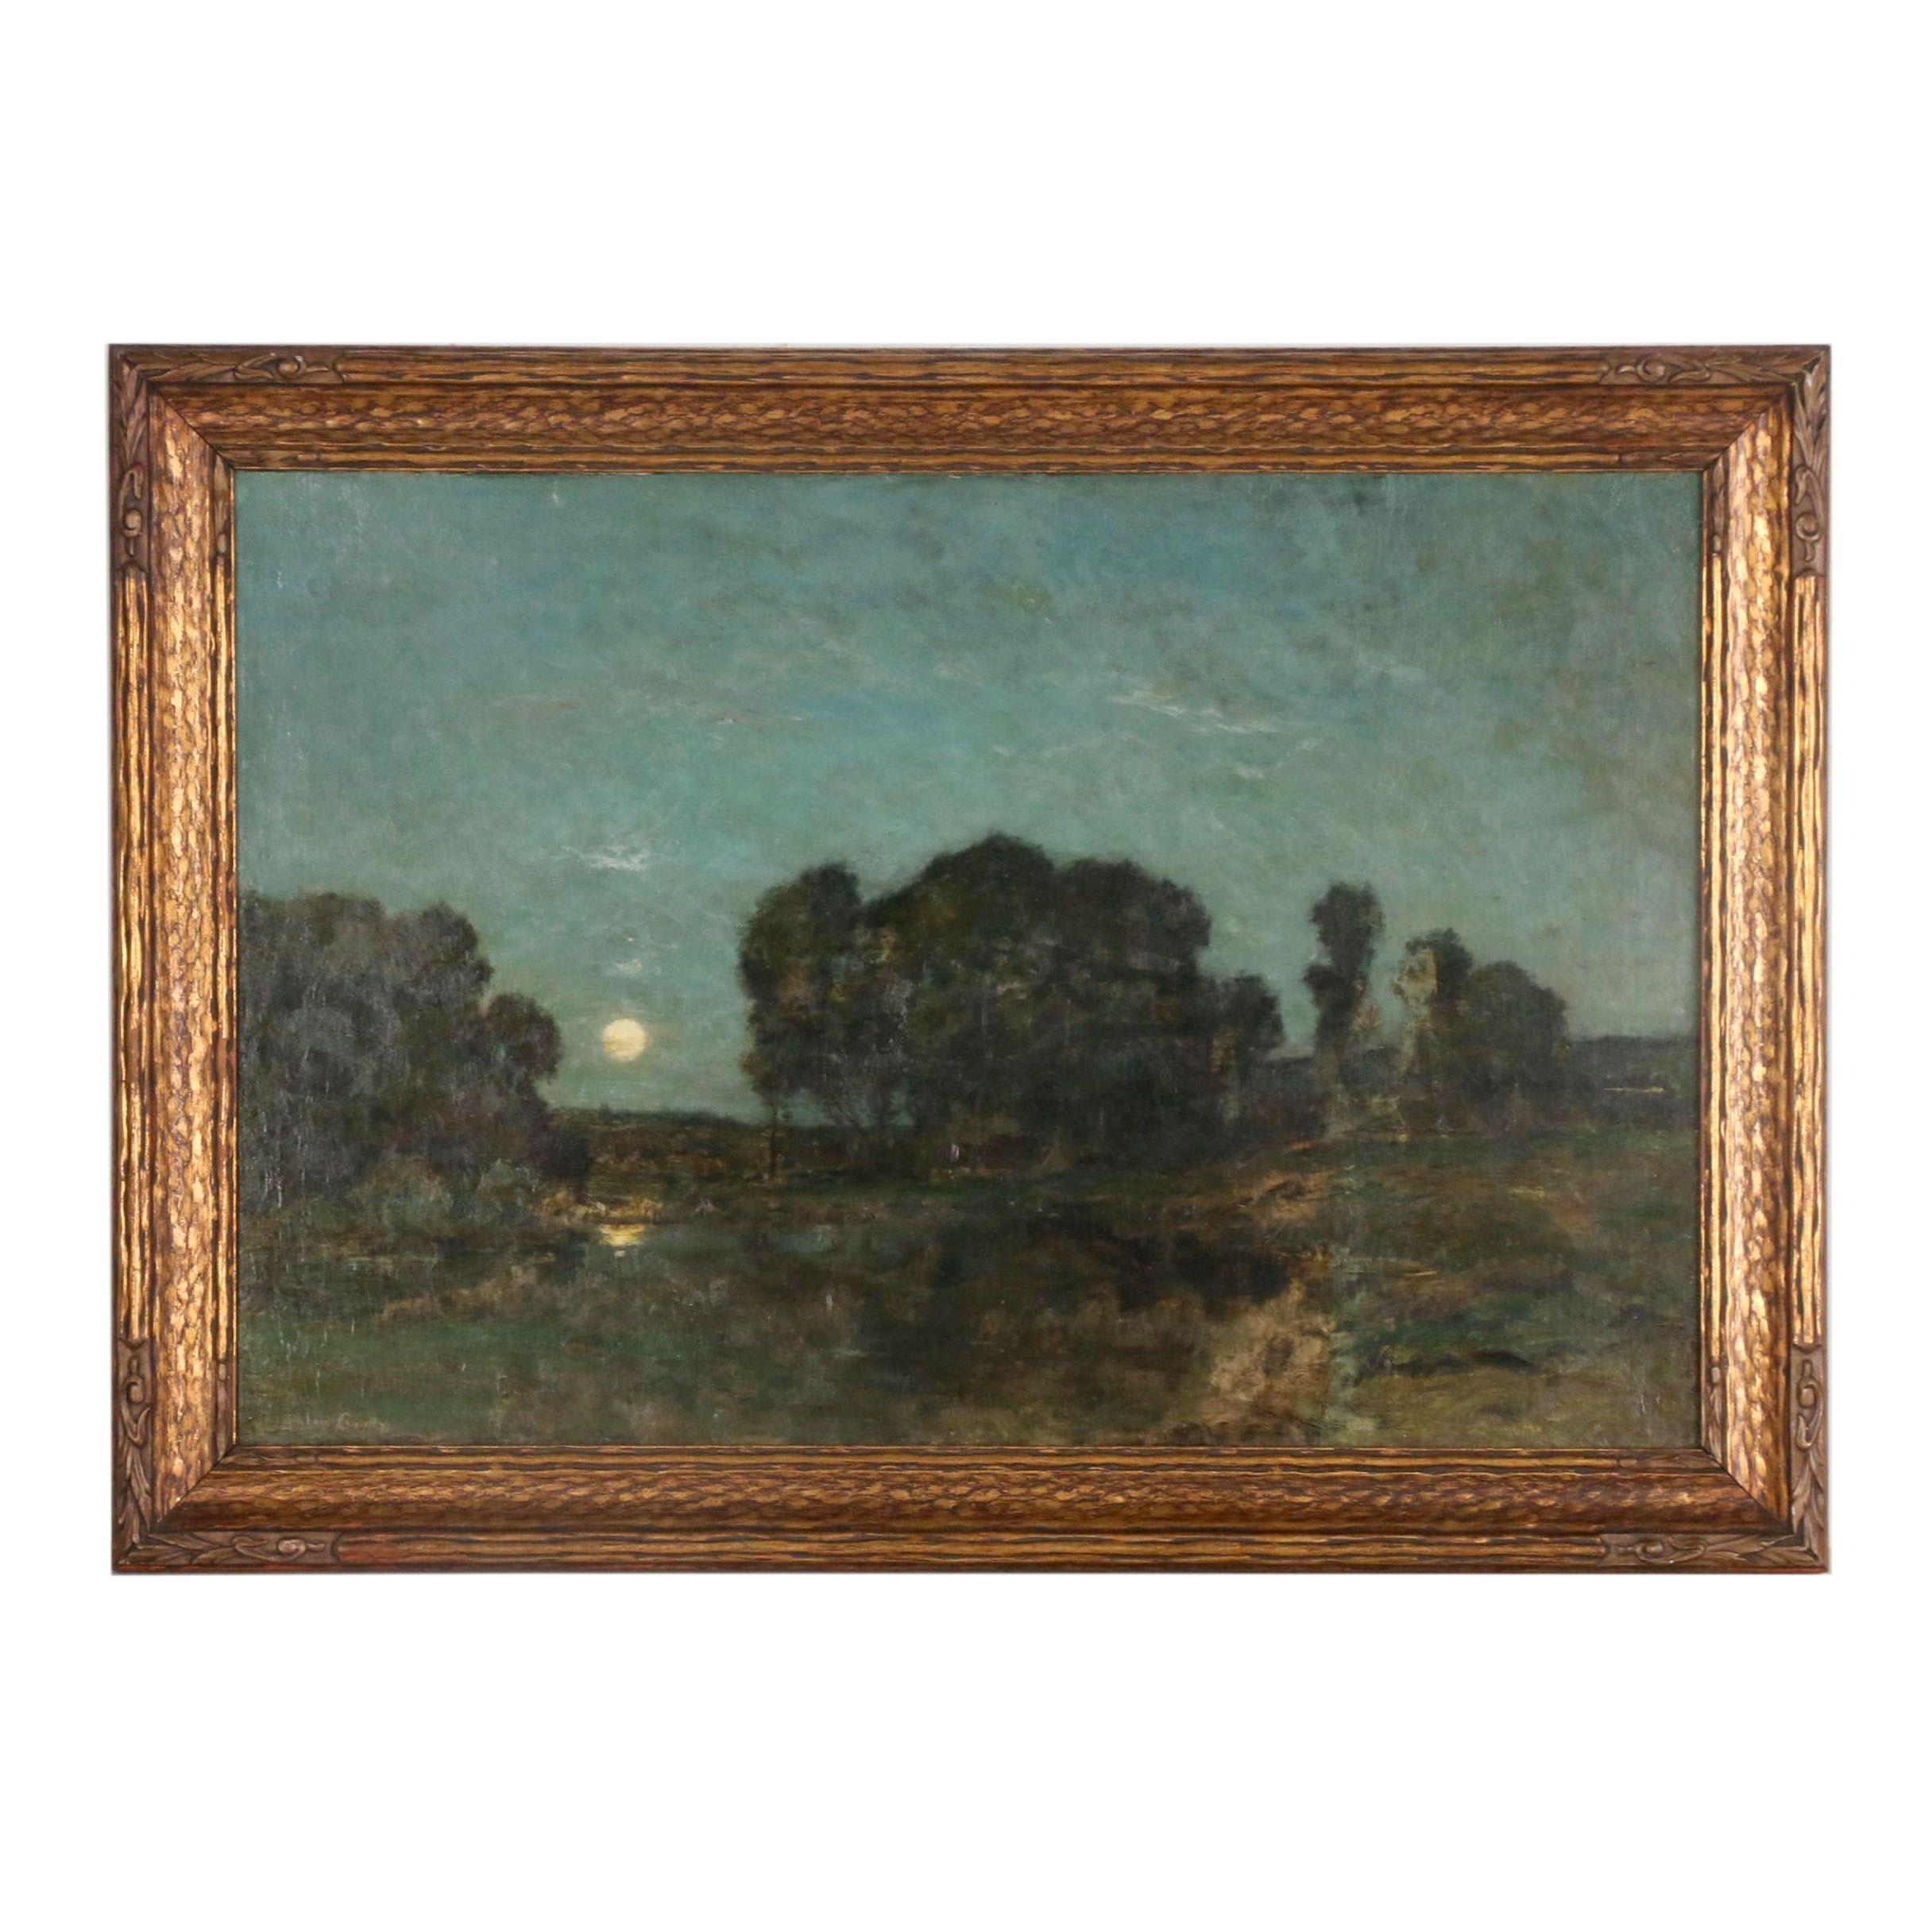 1870 Tonalist Oil Painting of Nocturnal Landscape